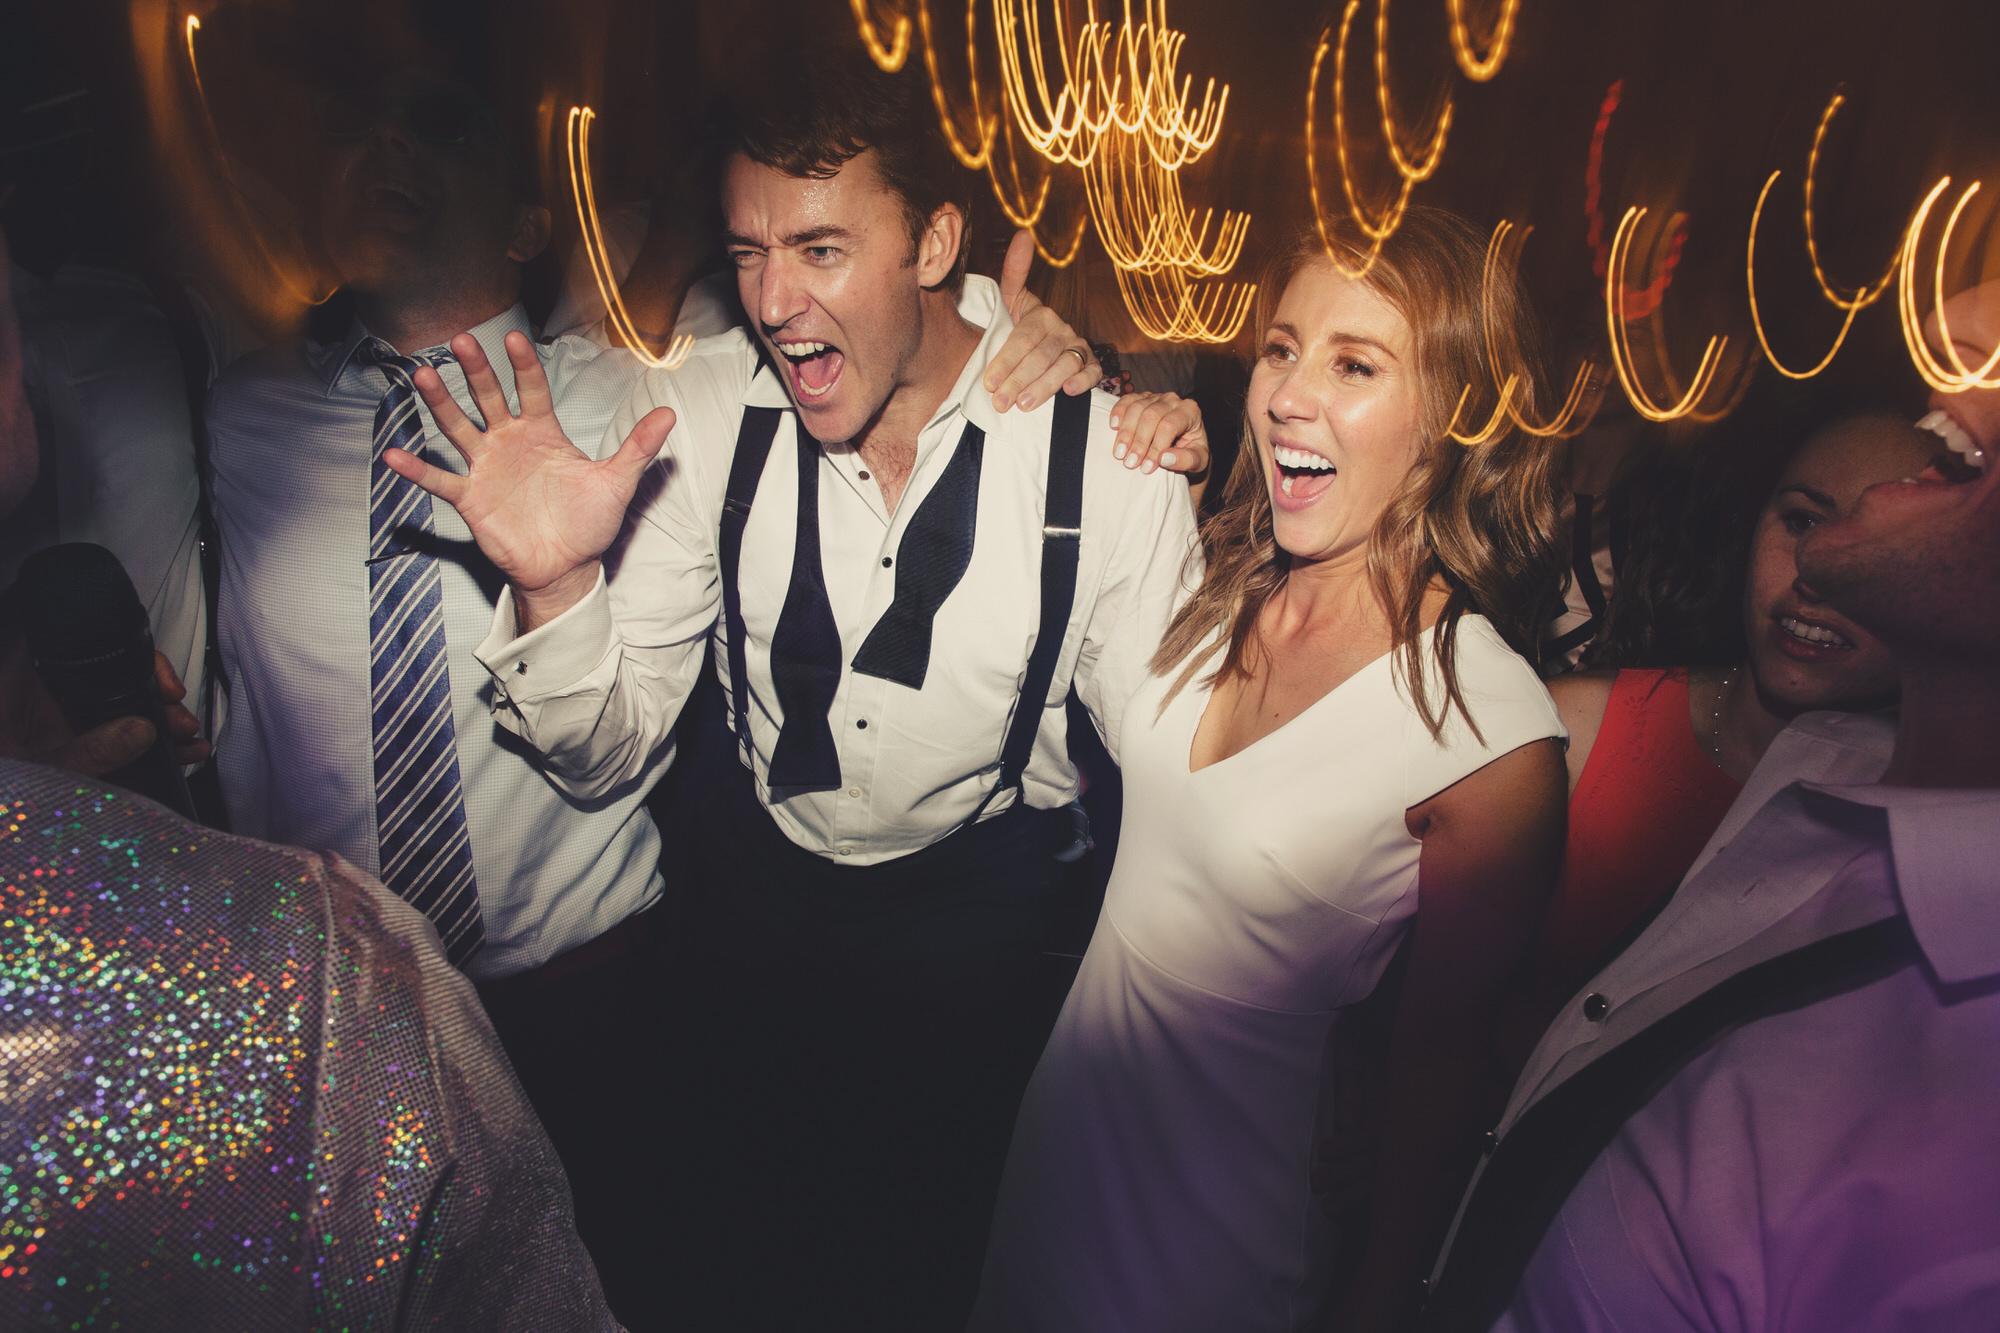 dancing at wedding